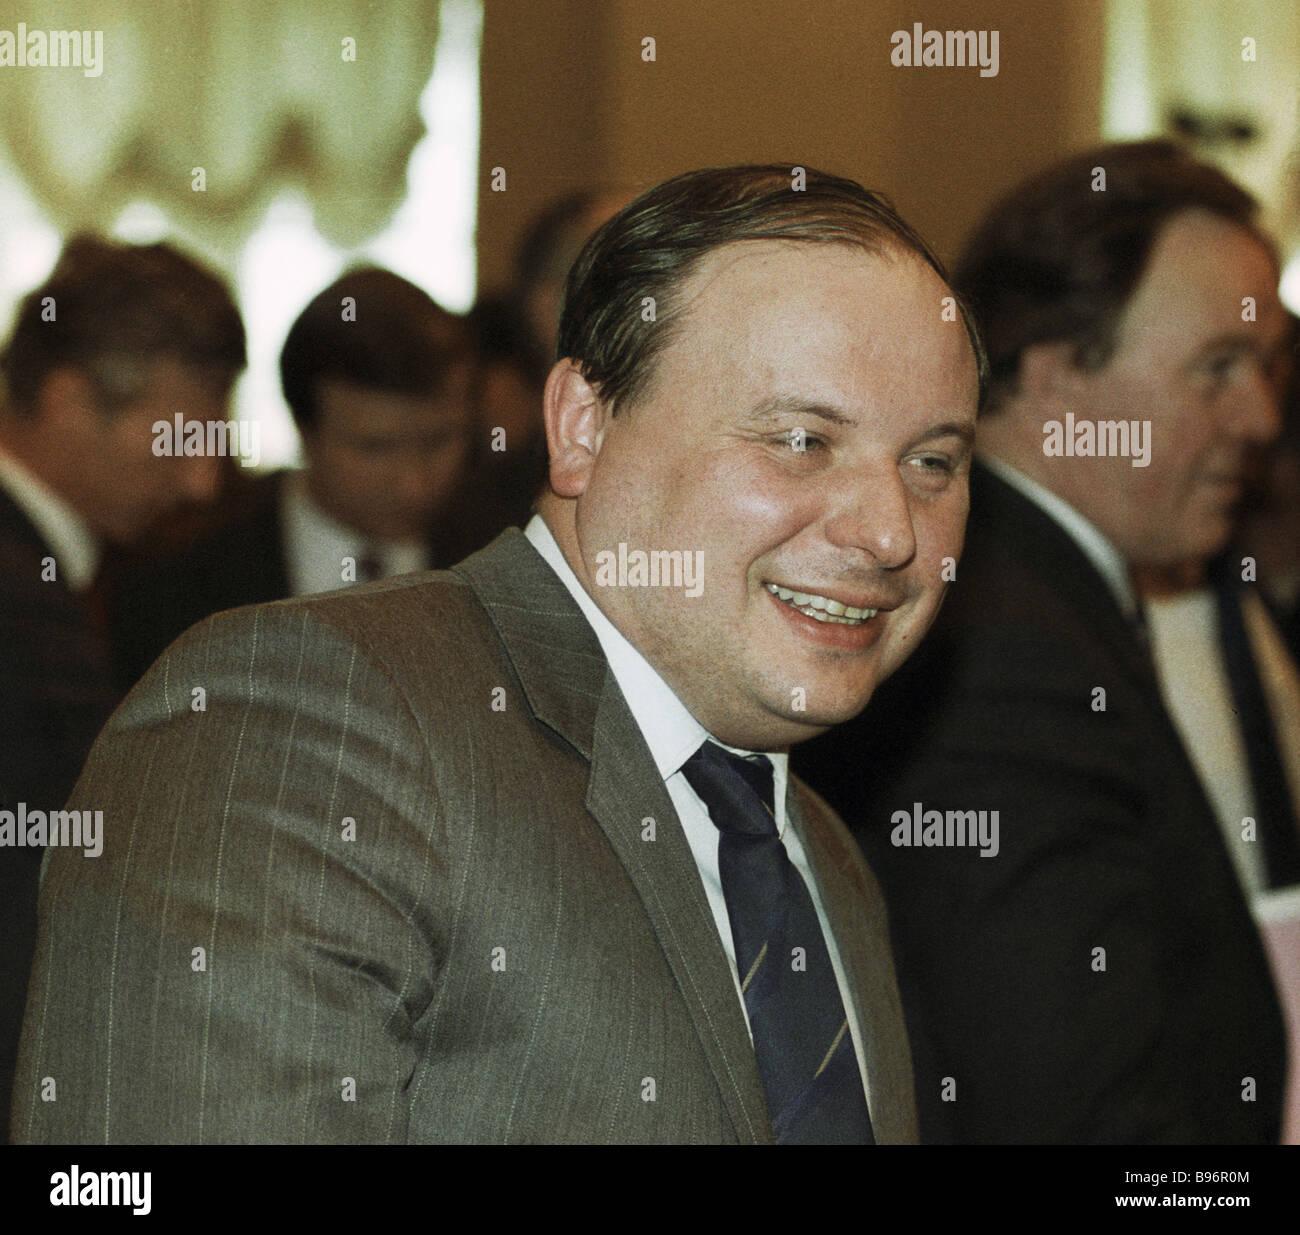 Yegor Gaidar, Russian politician: biography, personal life, reforms 95